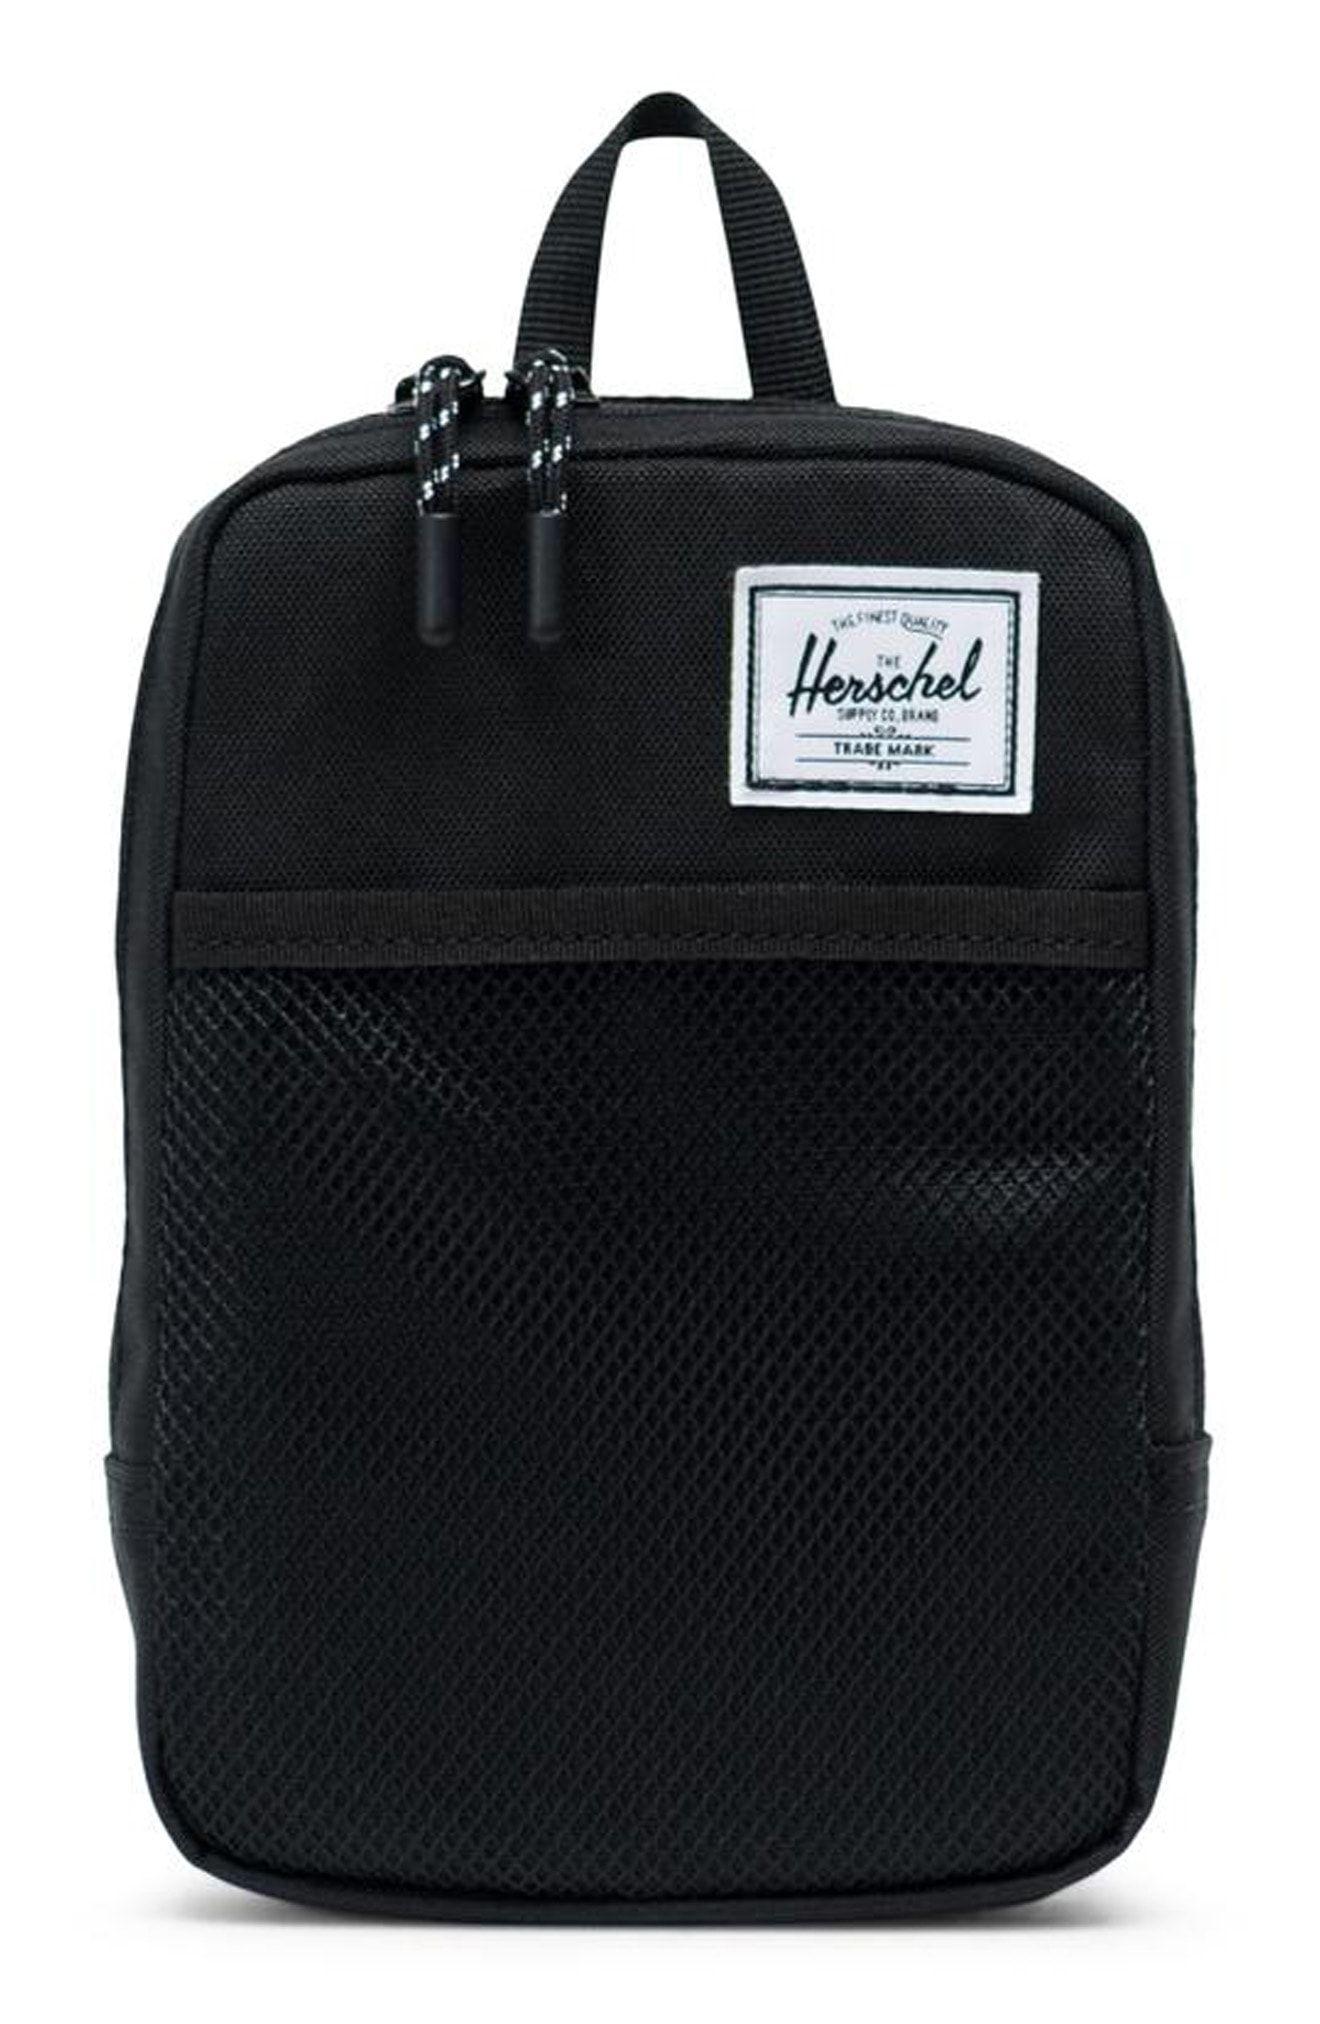 75aa4551f68 HERSCHEL SUPPLY CO. LARGE SINCLAIR CROSSBODY BAG - BLACK.   herschelsupplyco.  bags  shoulder bags  crossbody